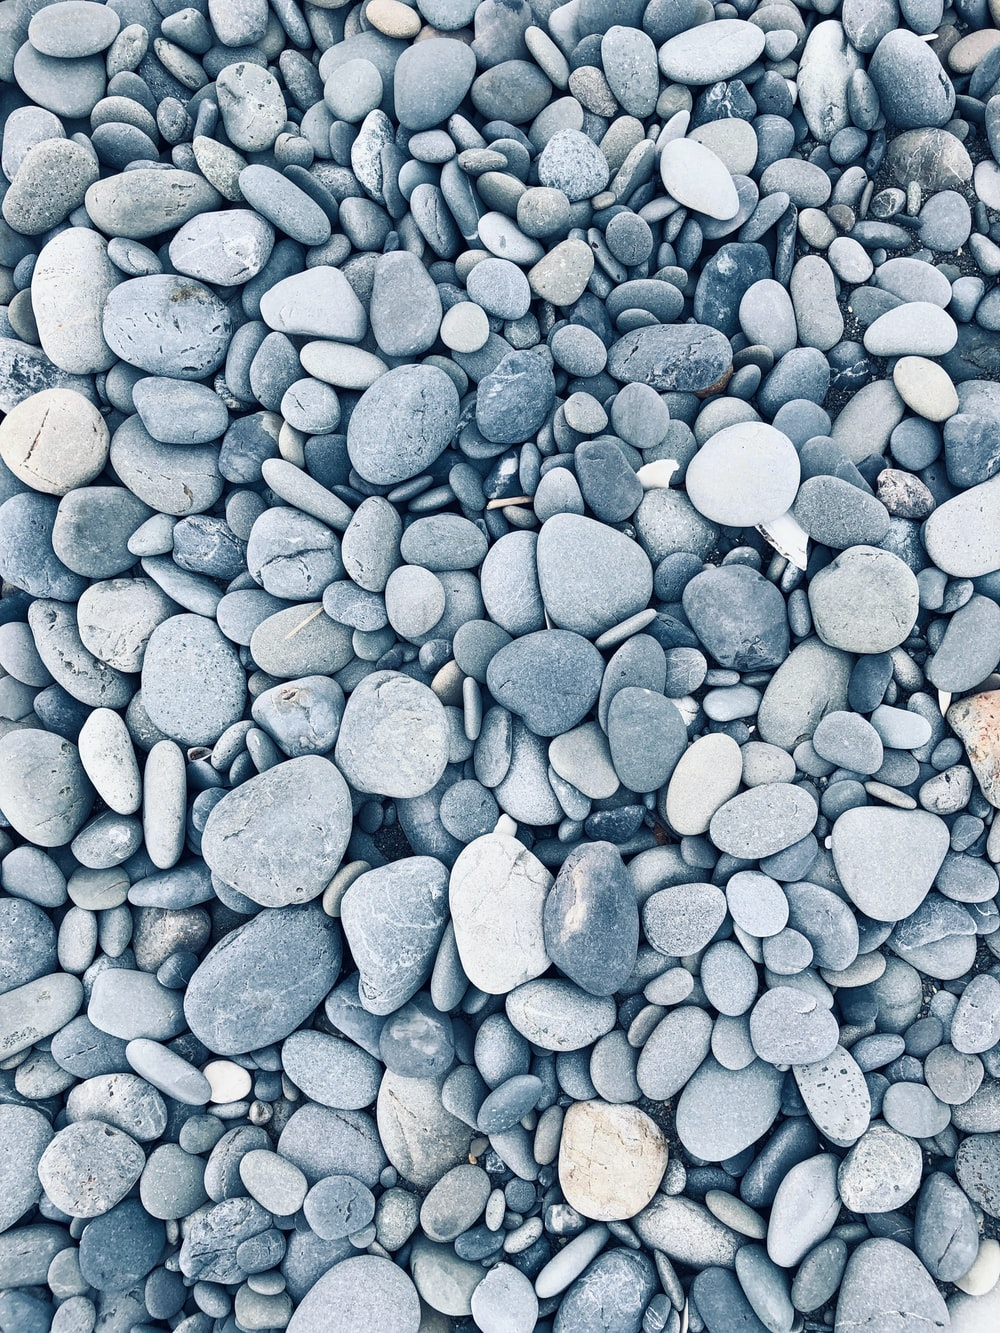 gray rock lot